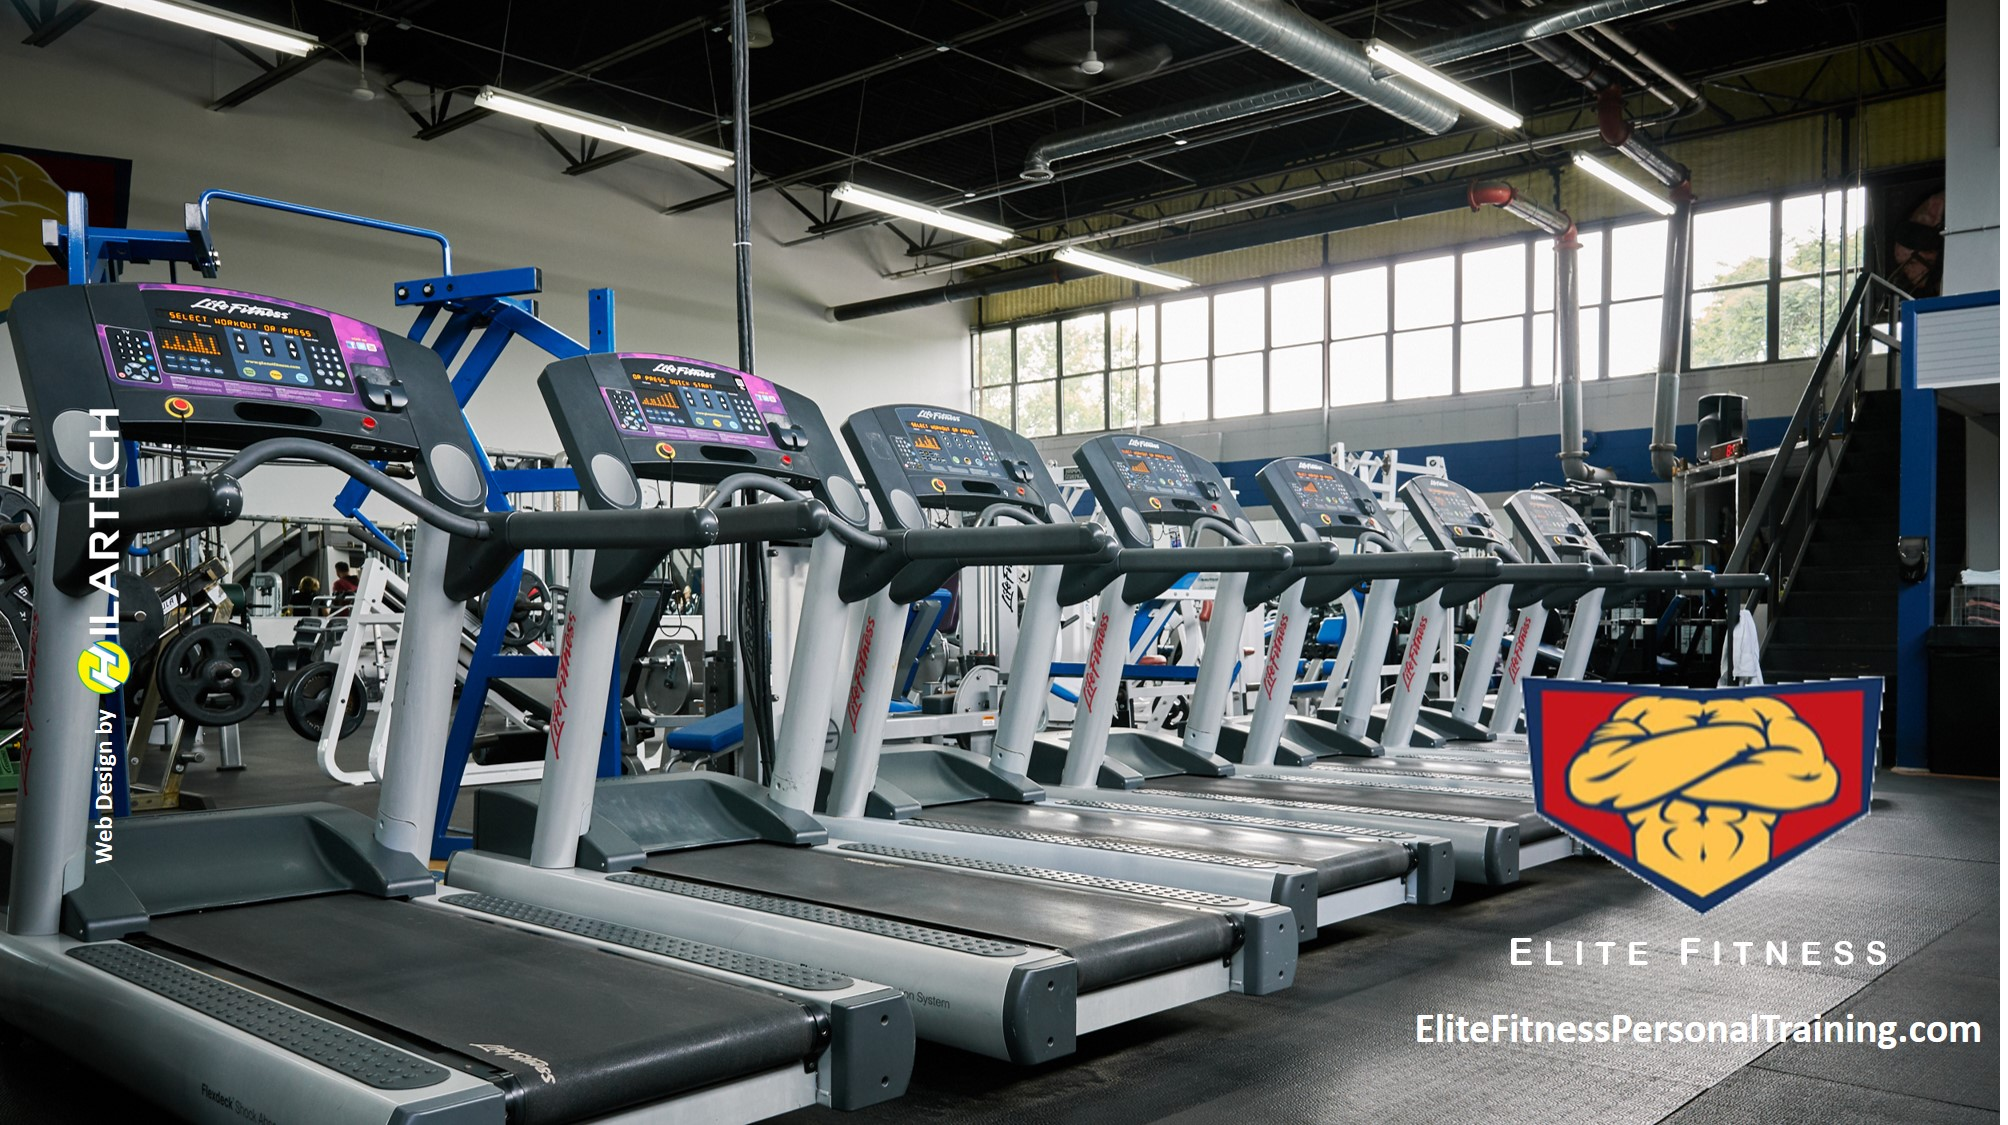 Elite Fitness Personal Training Penfield Ny Gym No Membership Fees